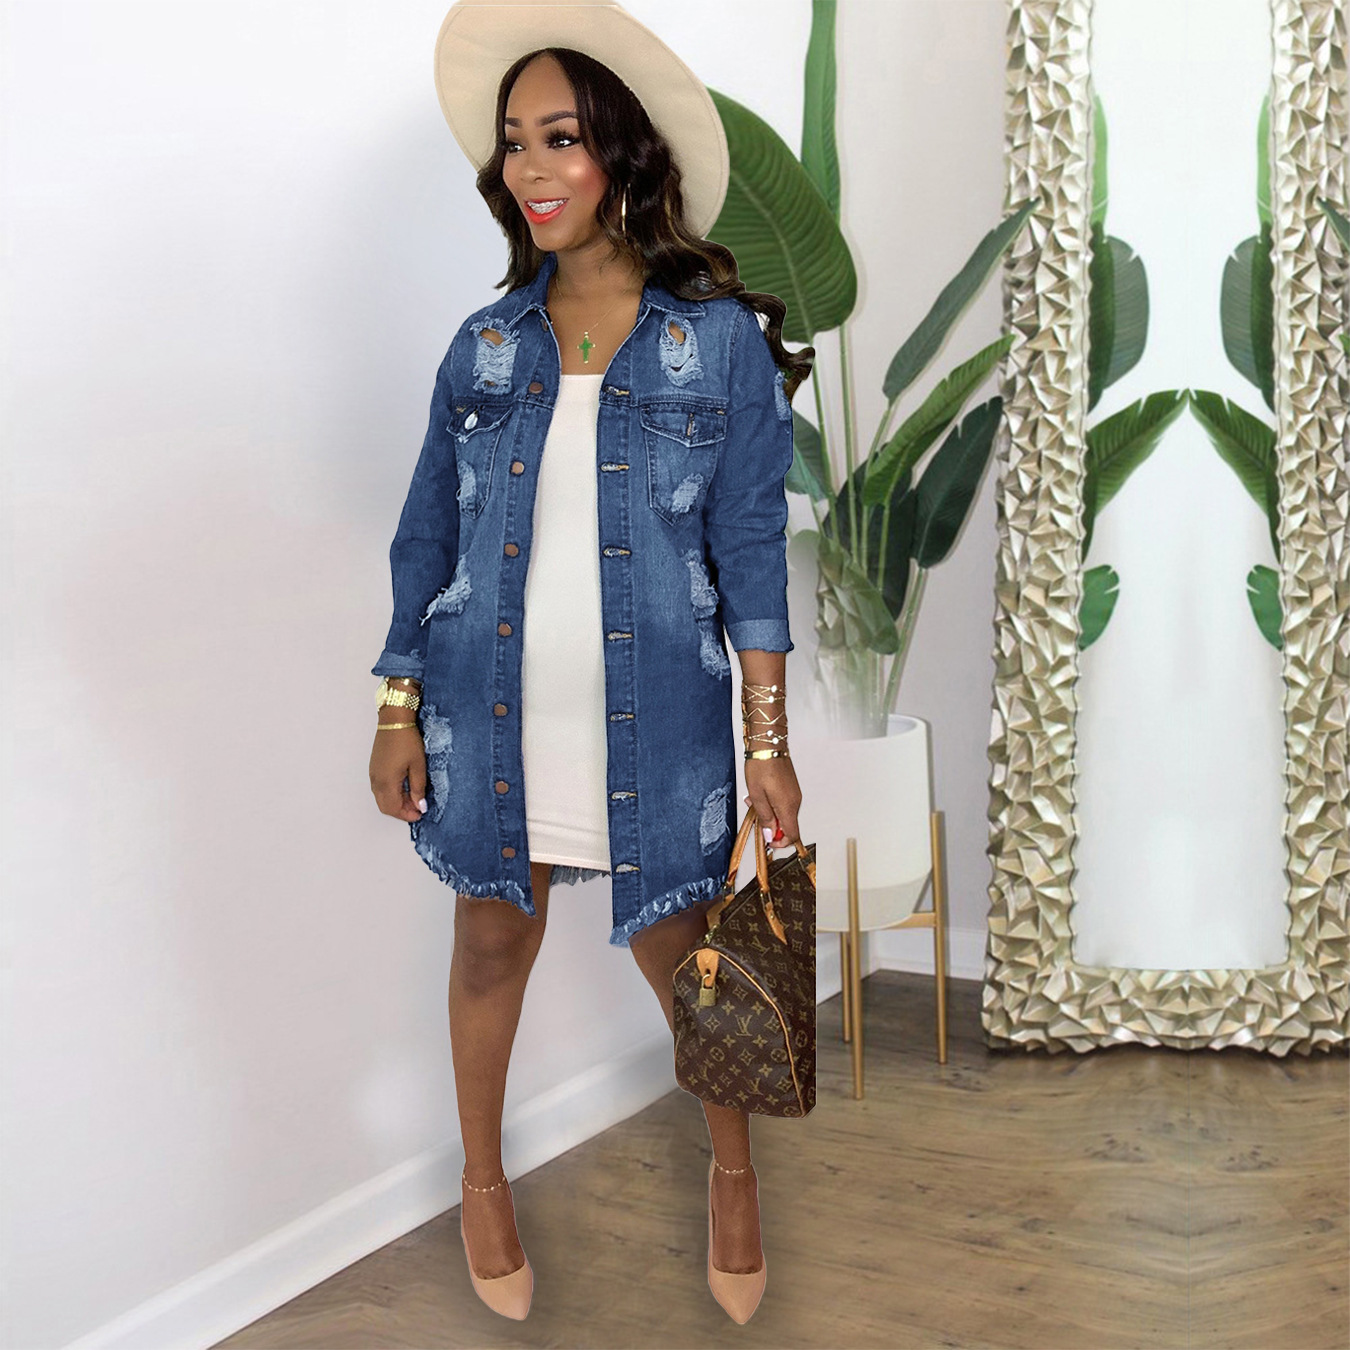 plus size women denim jacket fashion Hole long sleeve casual jackets 2021 new arrivals knee length oversize denim jacket 2XL 3XL